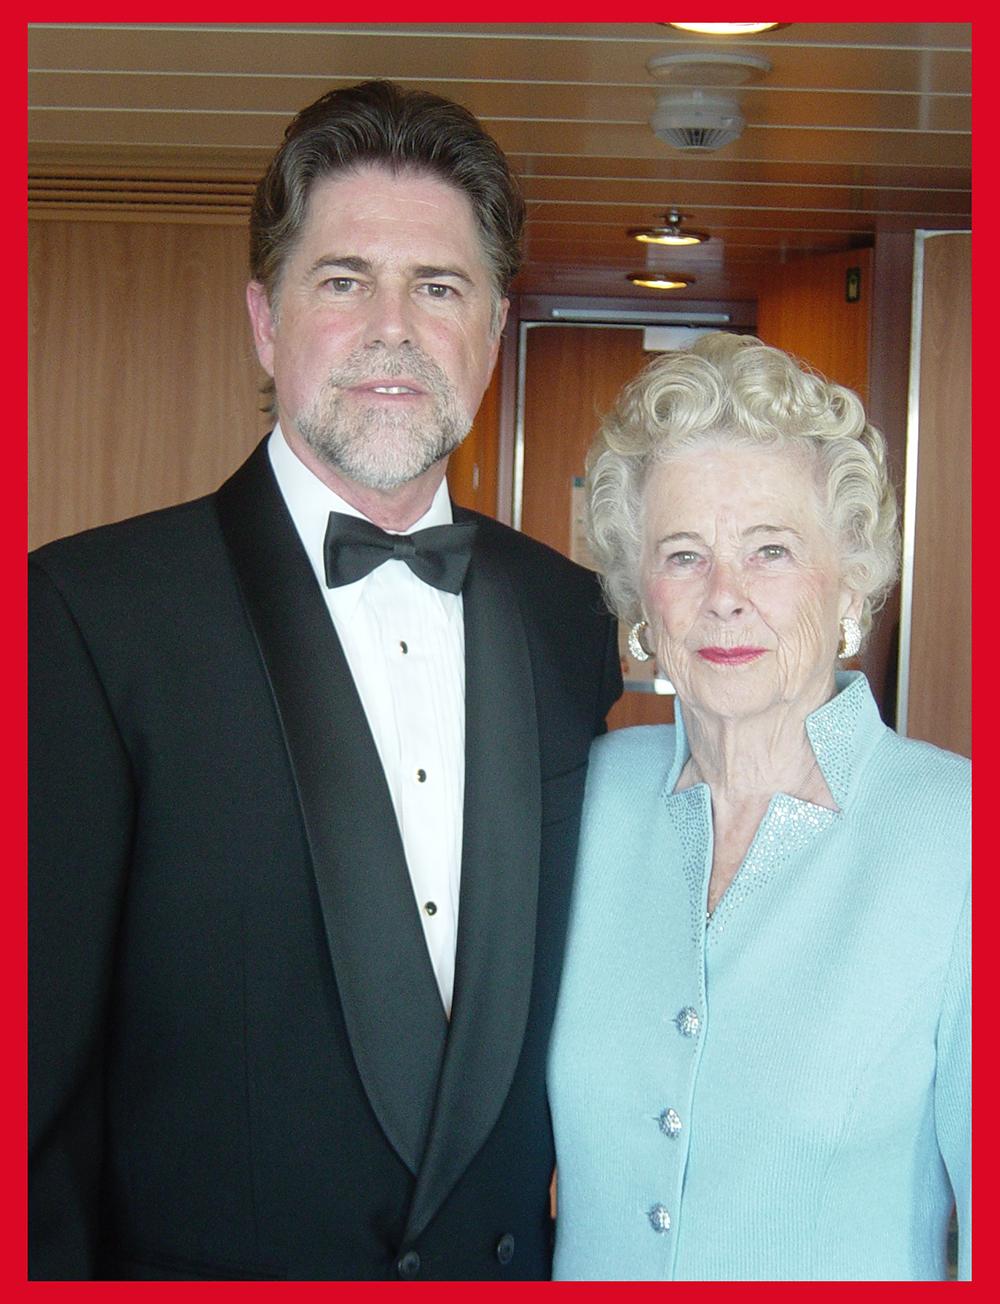 Stephen&Mom.jpg